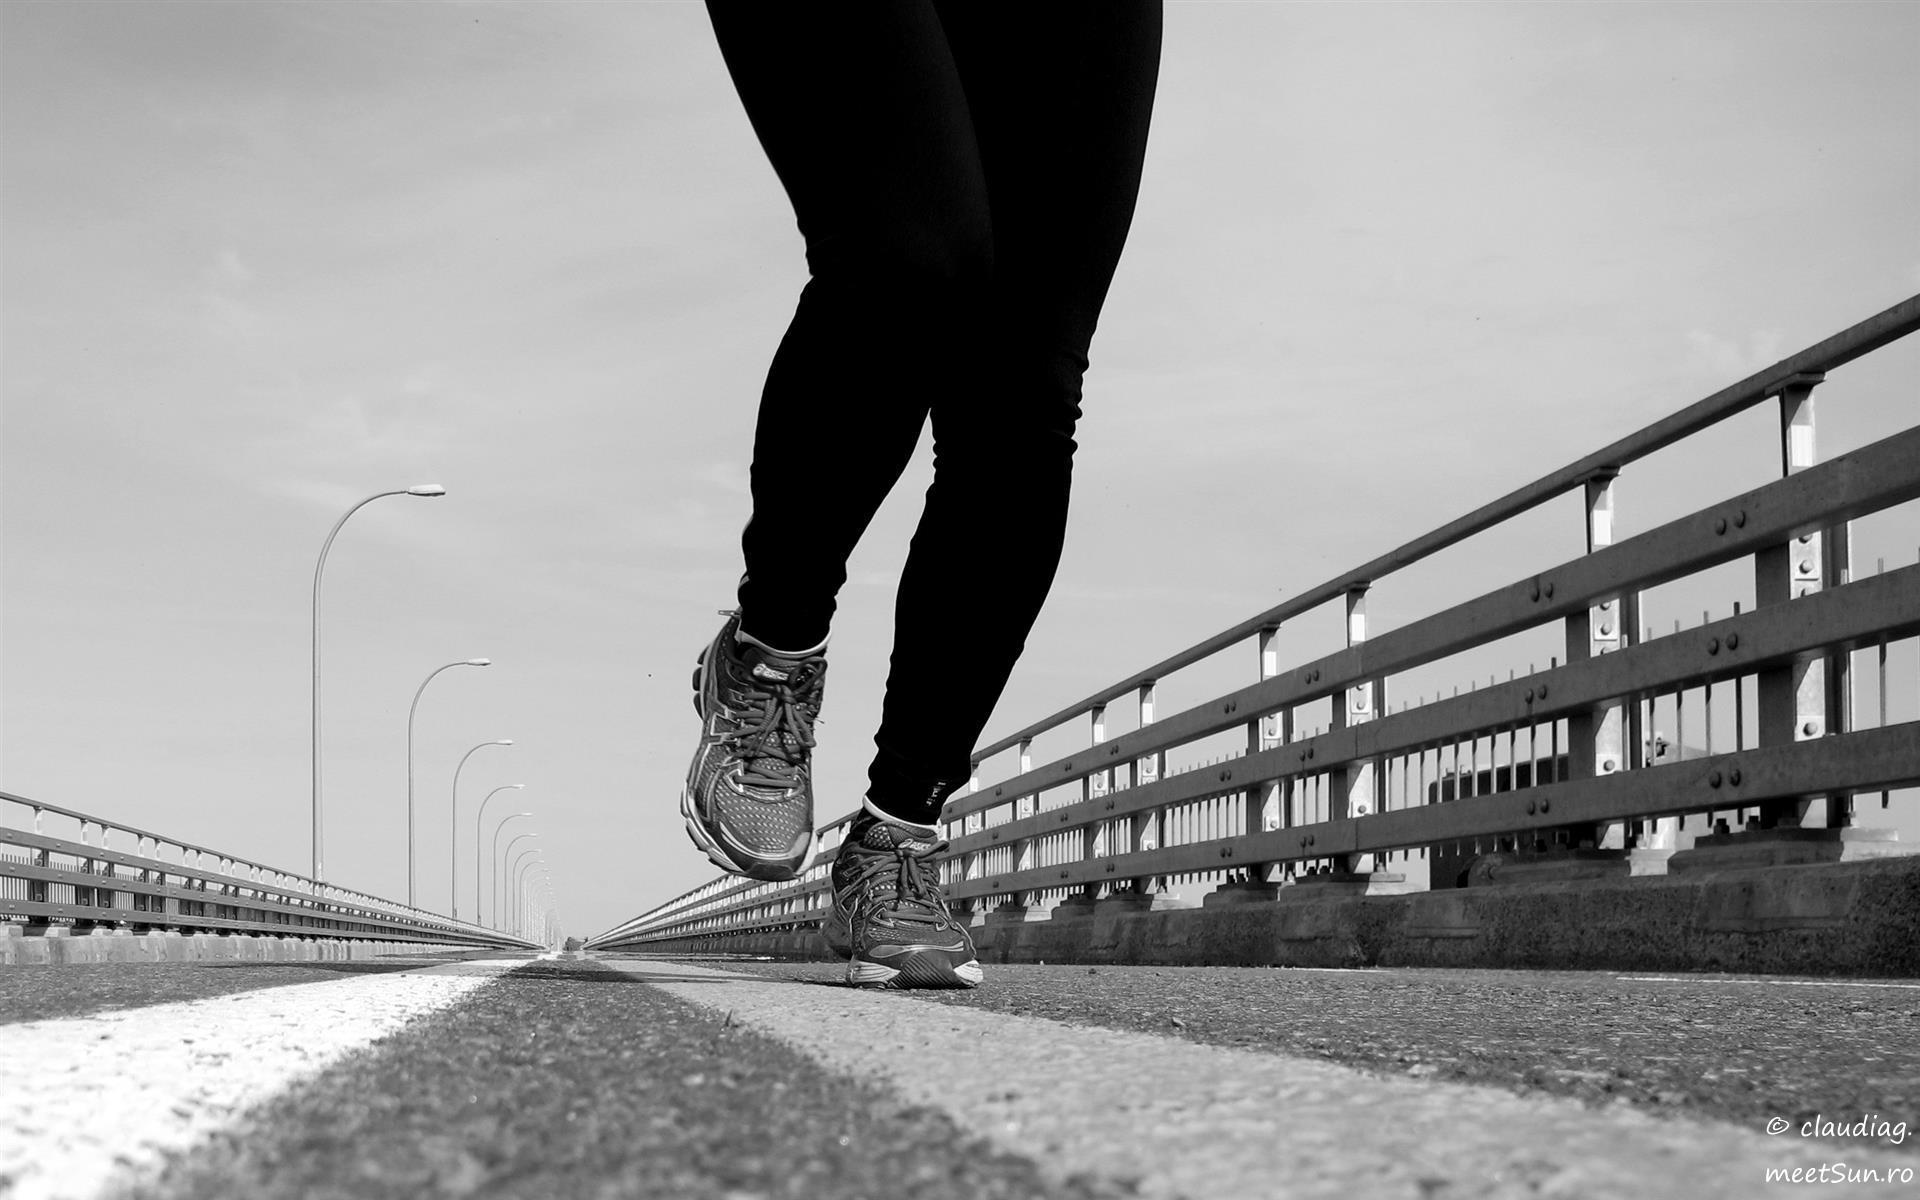 iubesc-alergarea